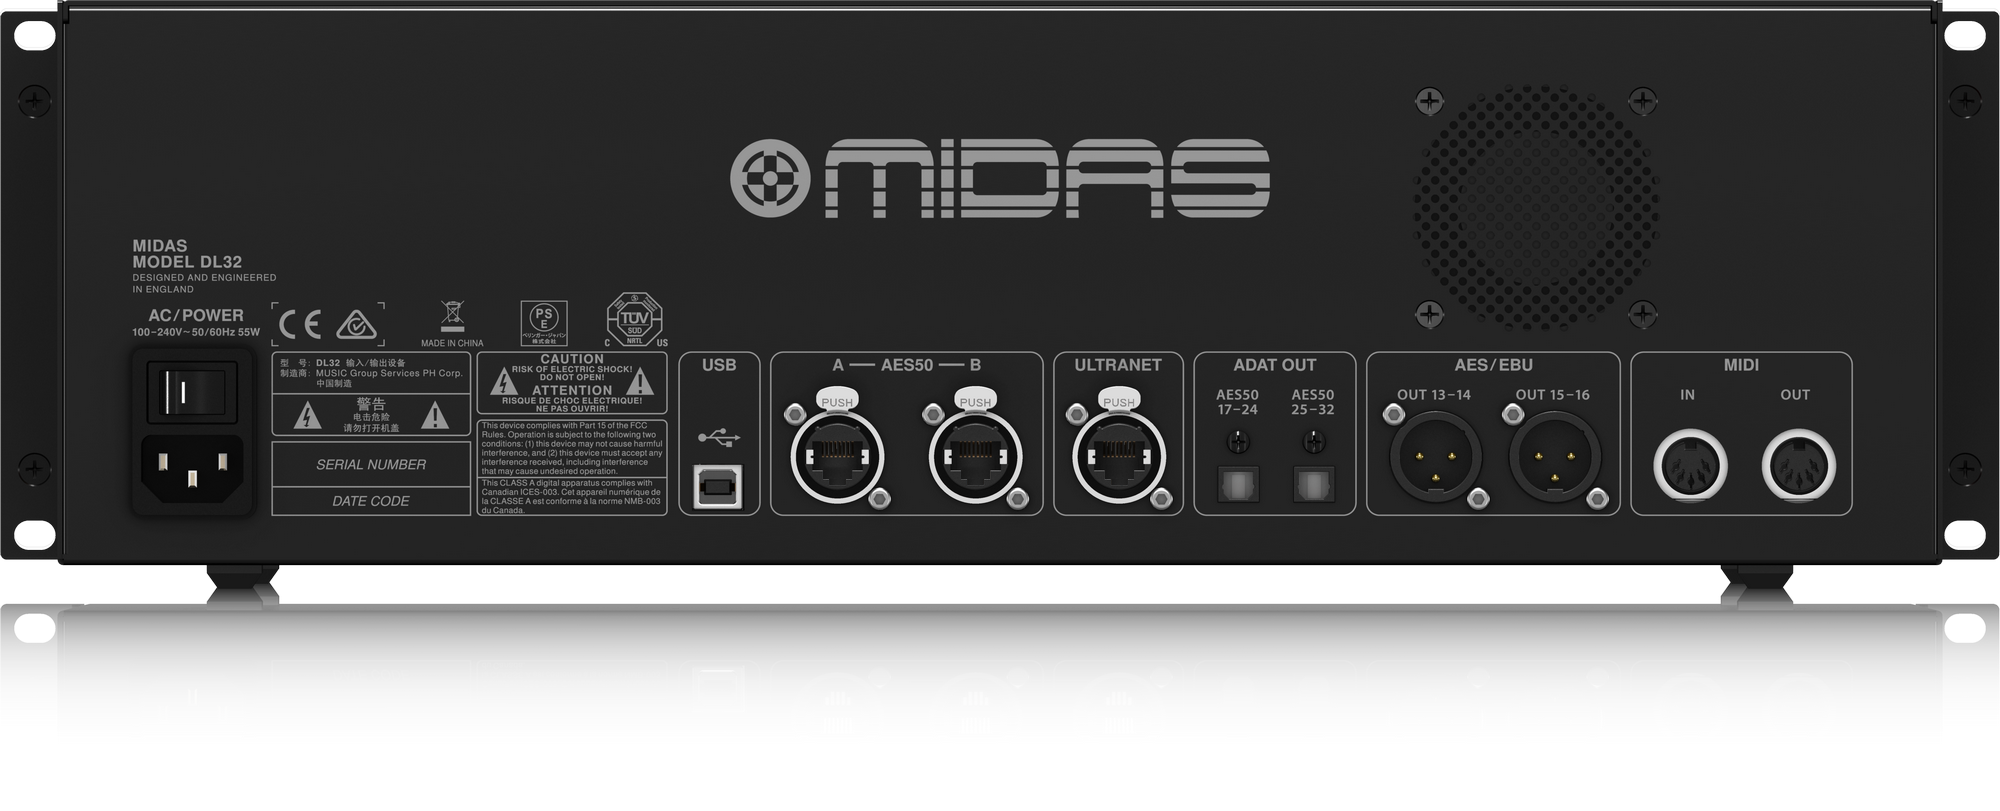 Midas M32R Live + DL32 Combi - Console with stageblock